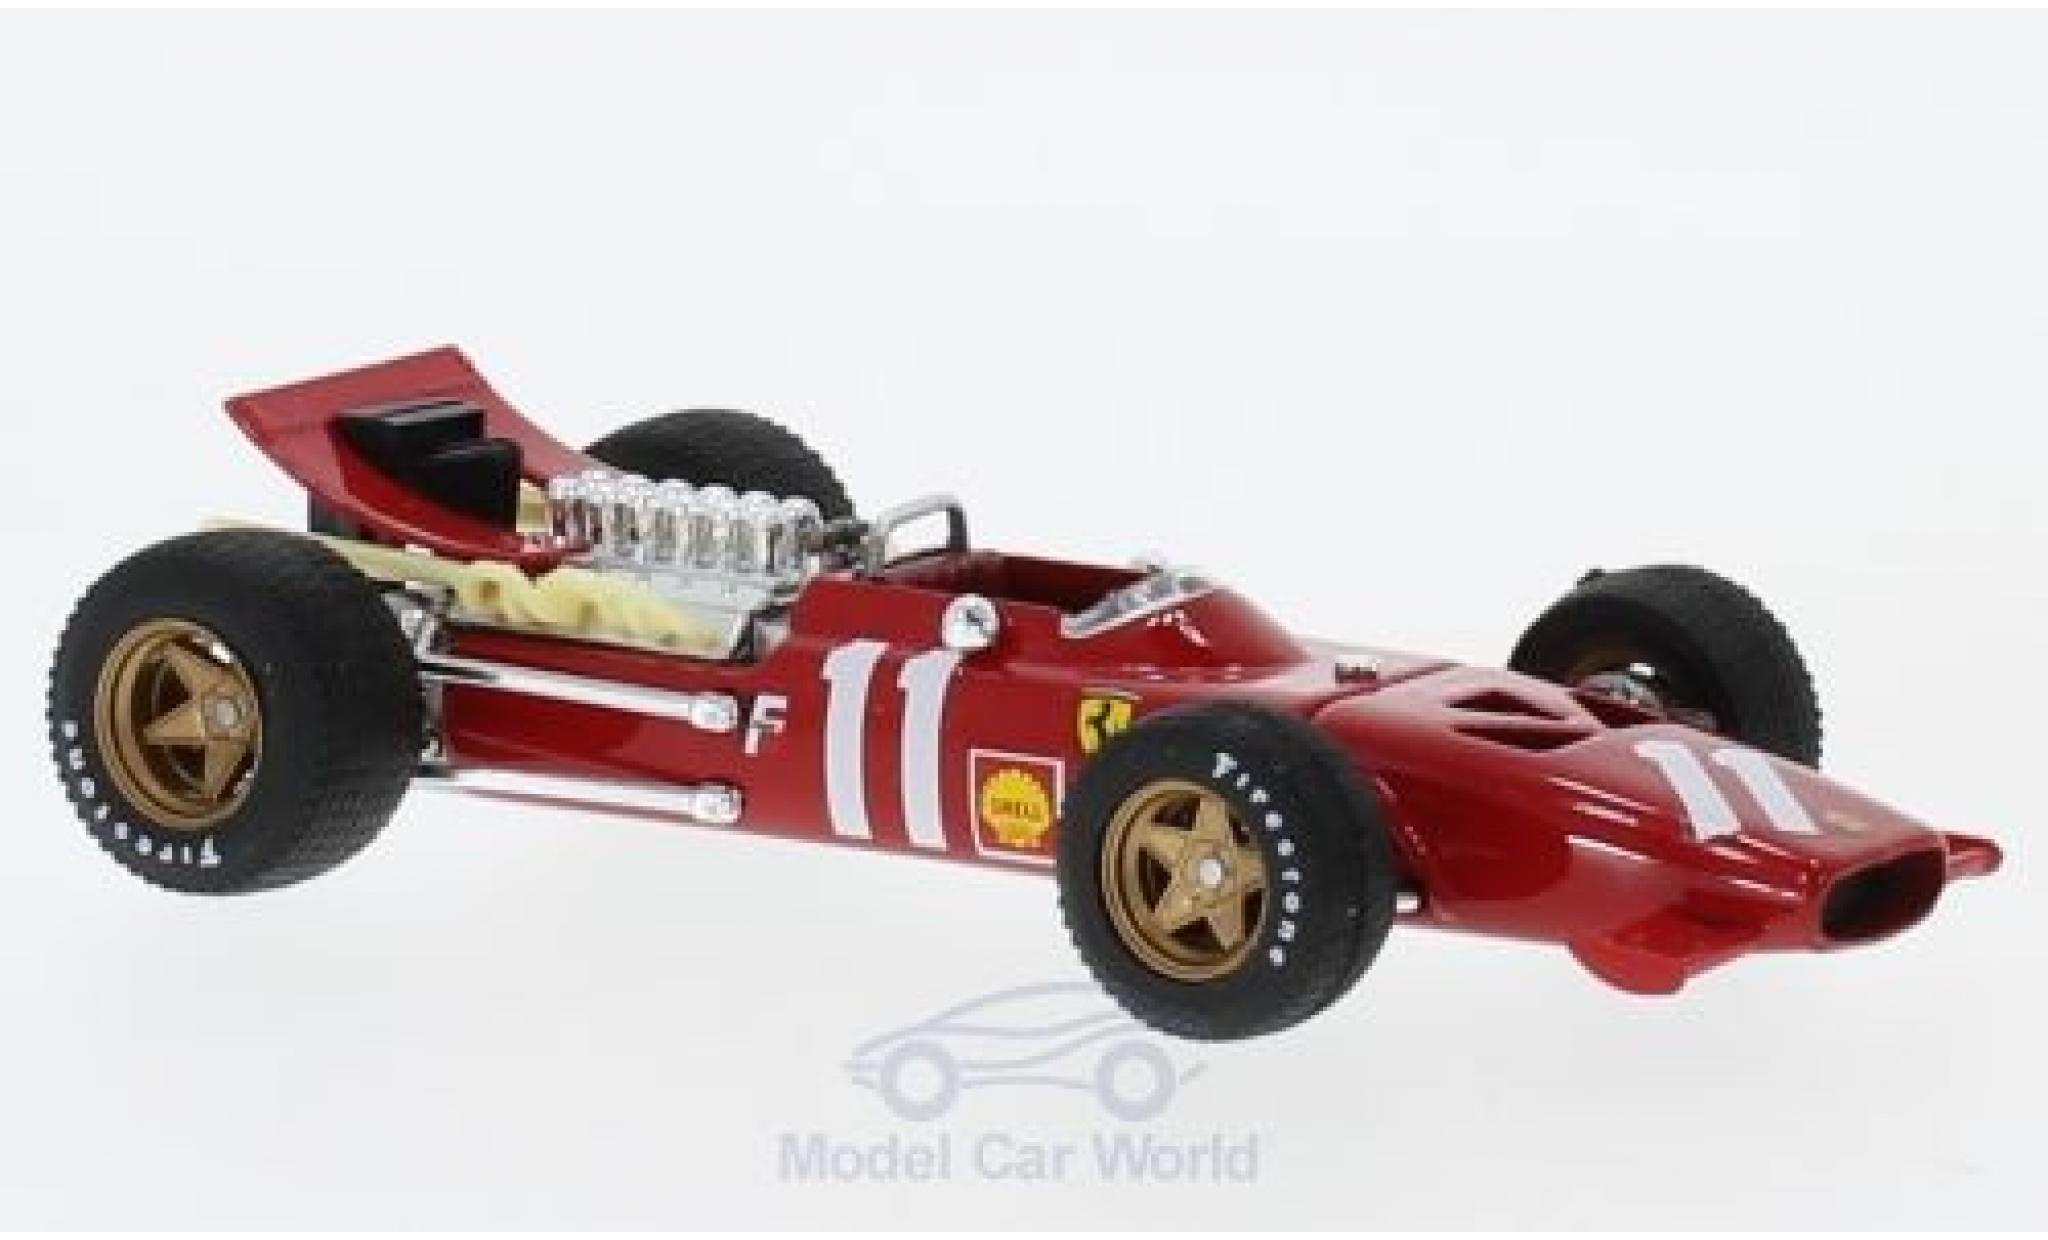 Ferrari 312 P 1/43 Brumm F1 No.11 Formel 1 GP Monte Carlo 1969 C.Amon